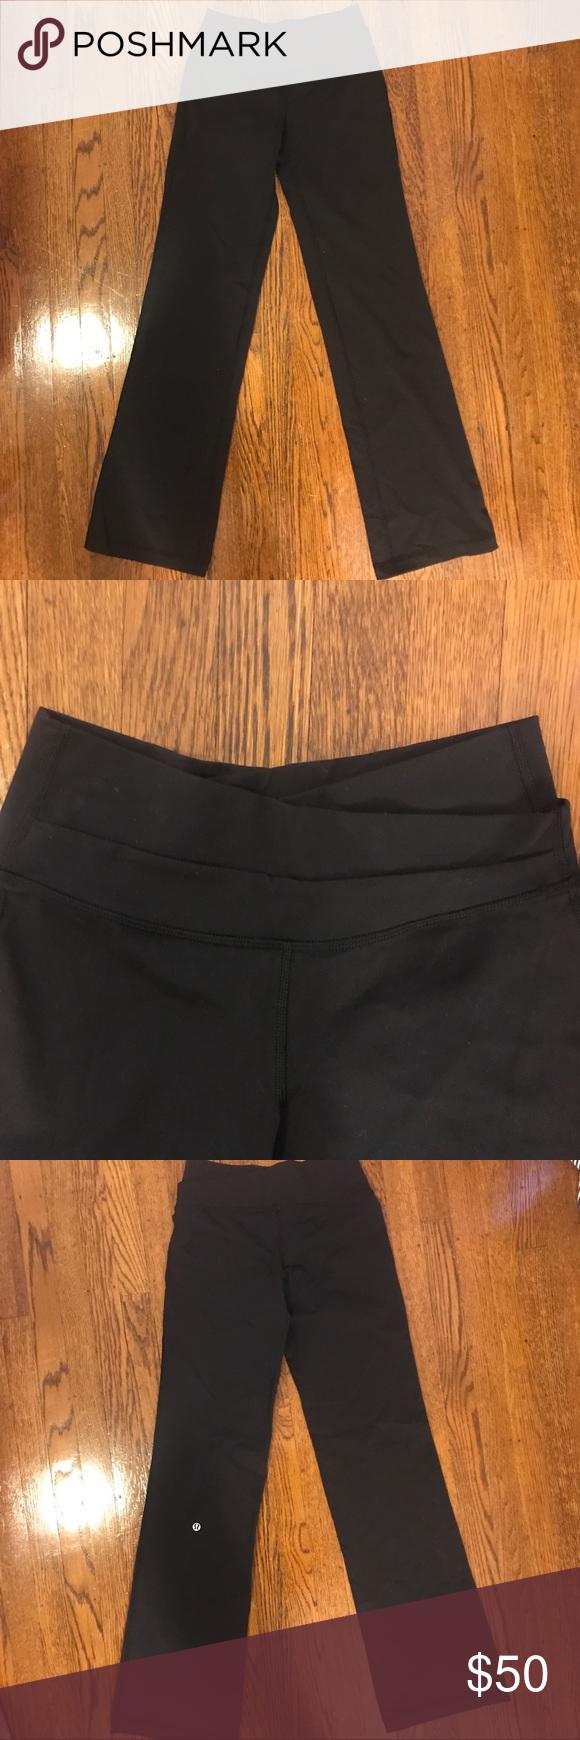 Lululemon Astro Pants in great condition Lululemon